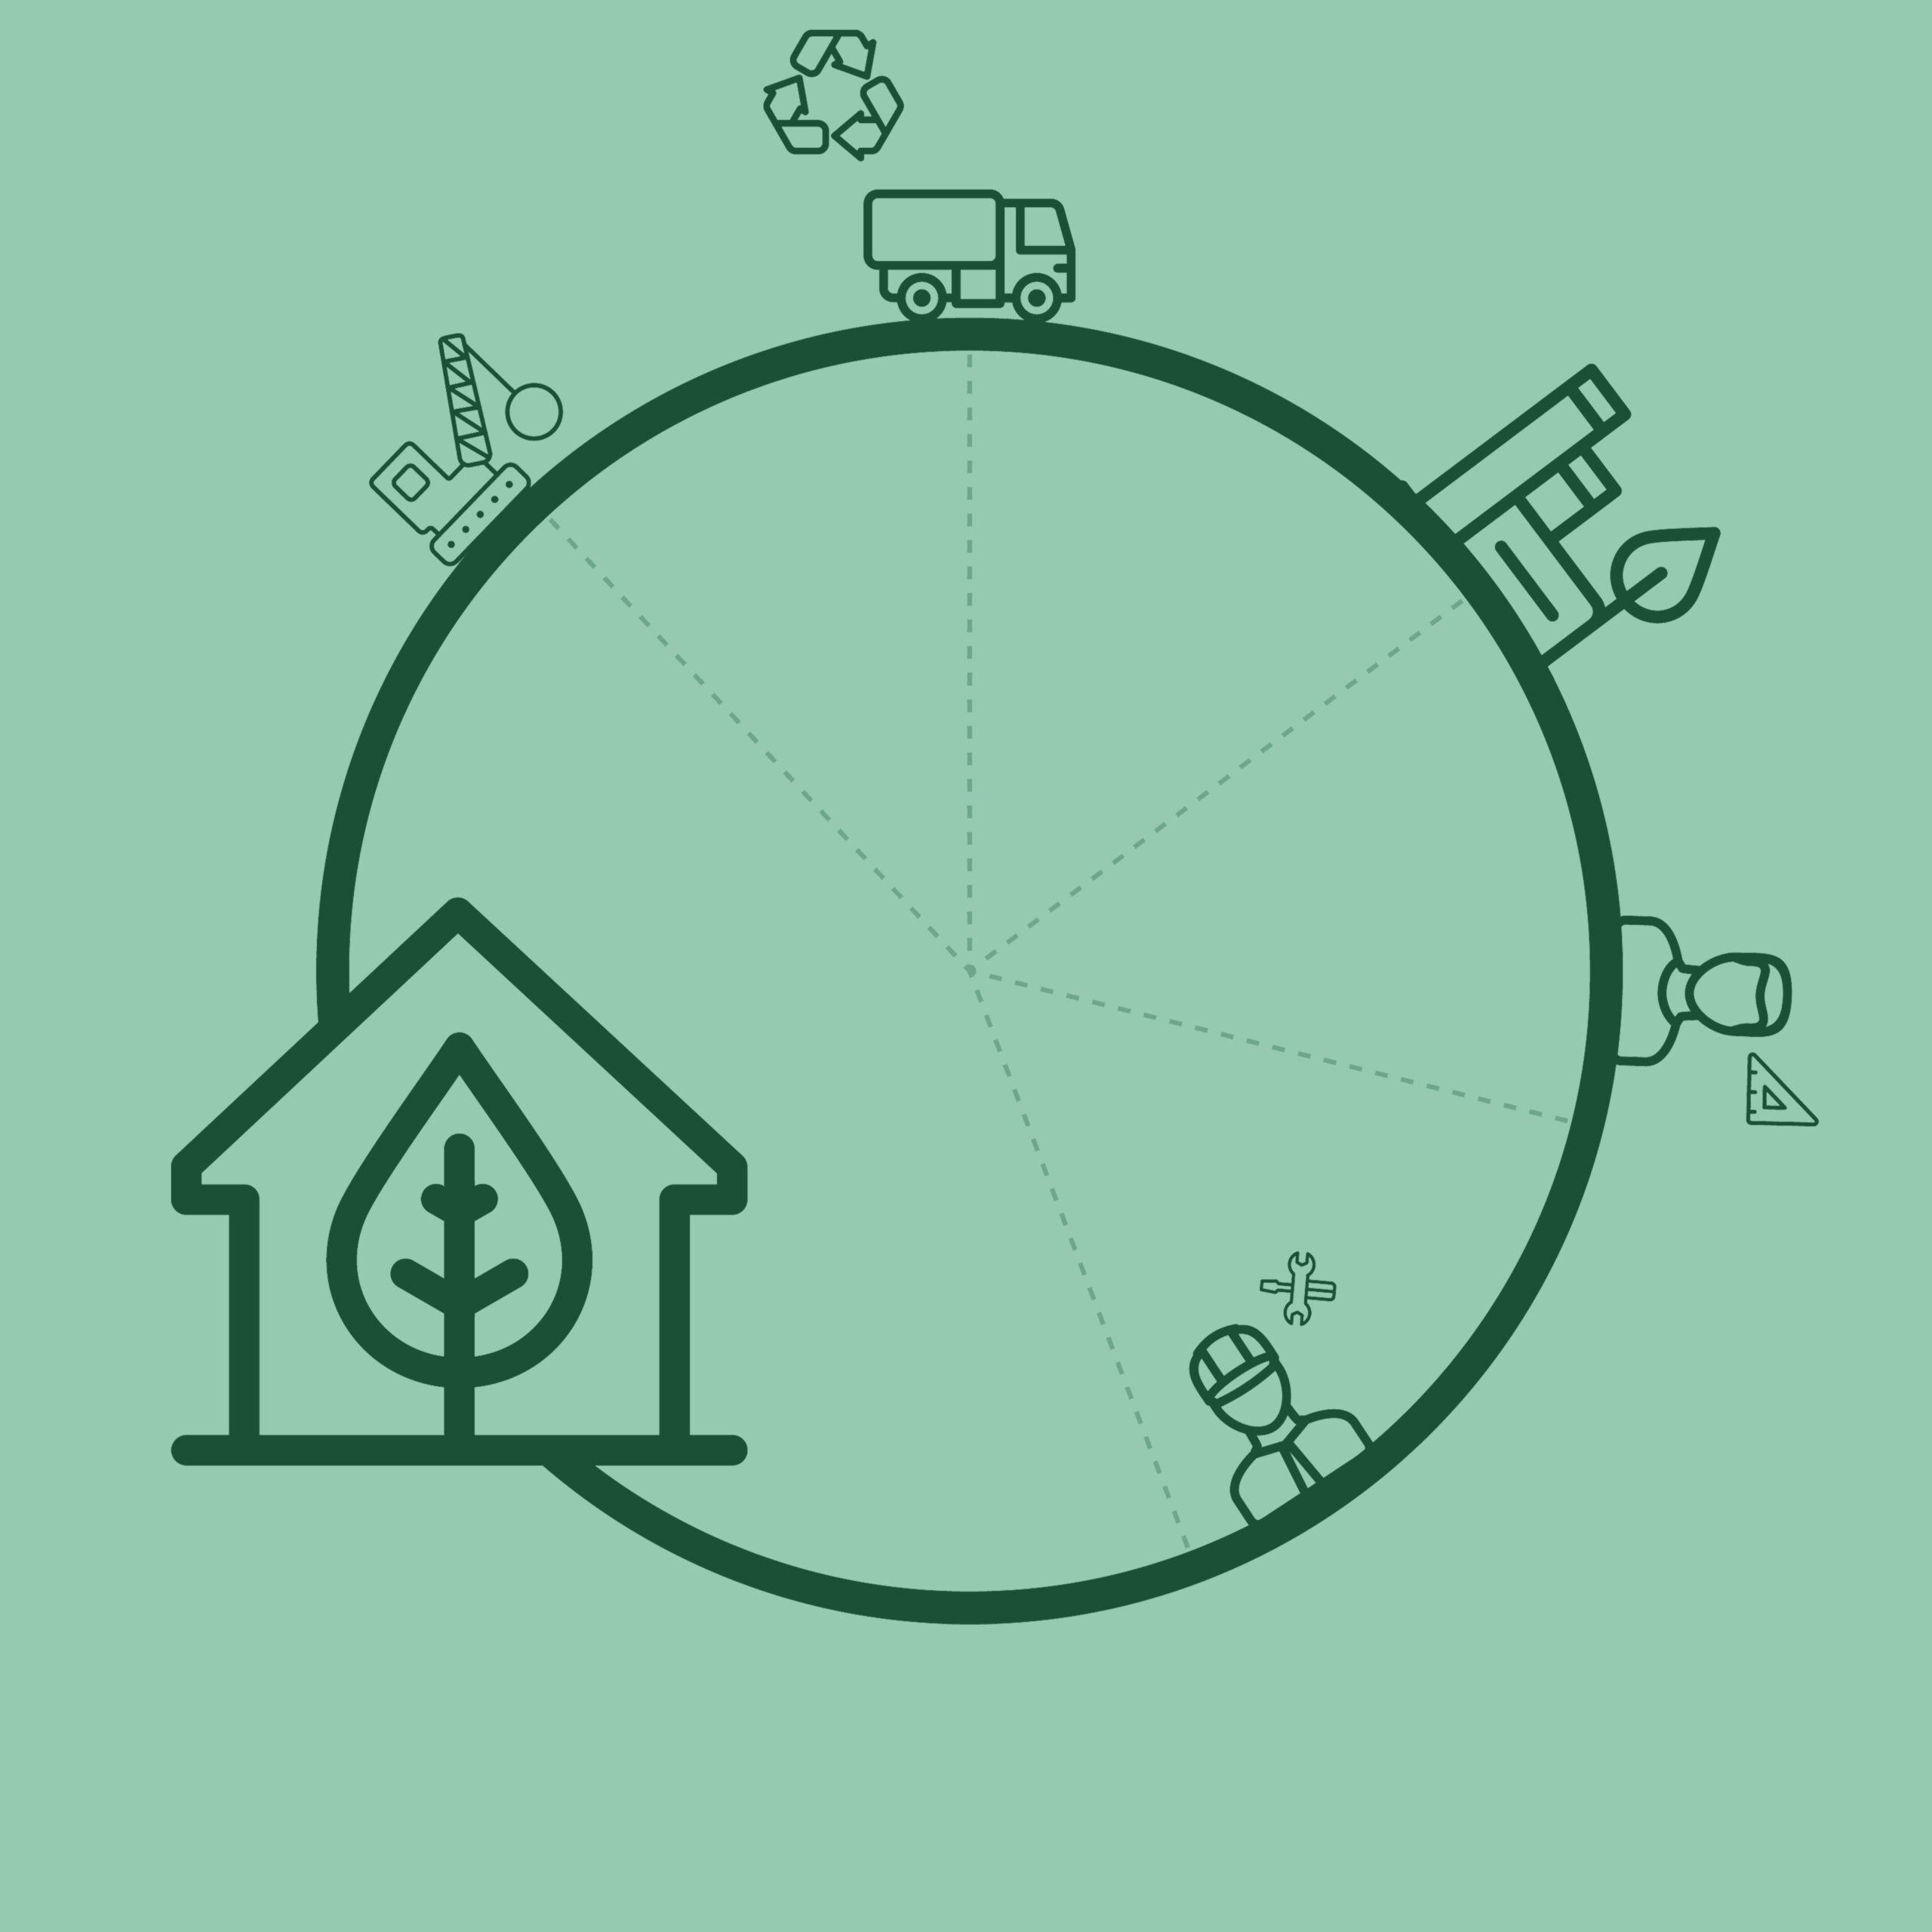 Infografia de economia circular